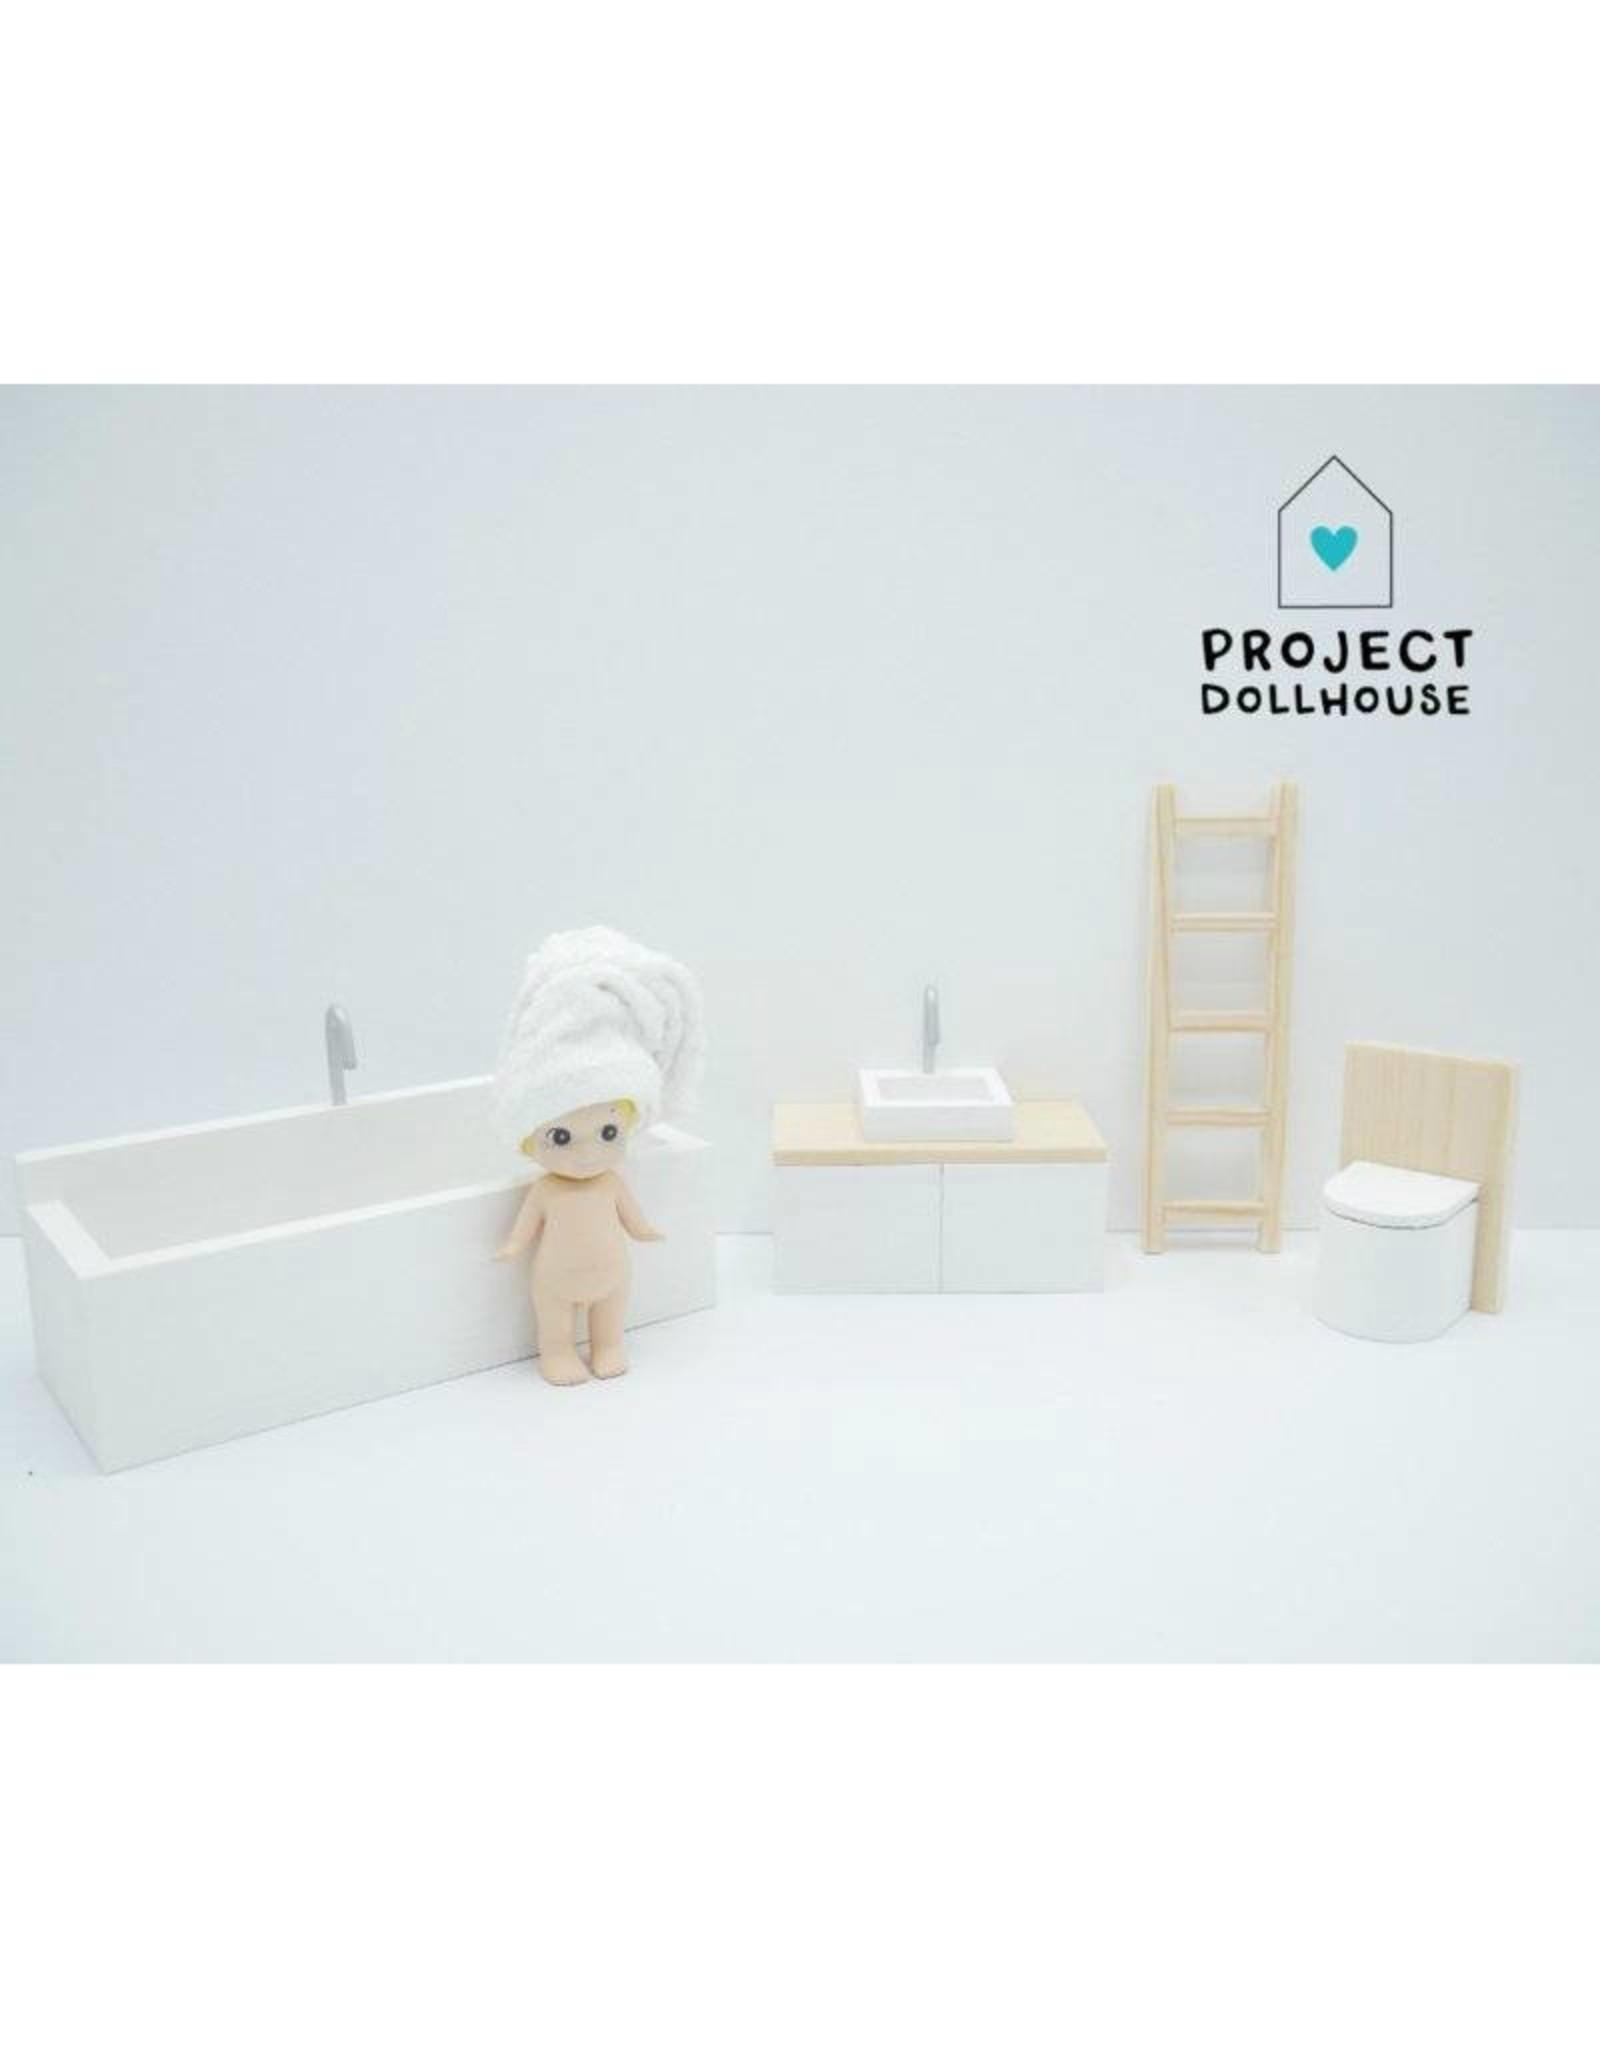 Project Dollhouse Badkamer Hout & Wit